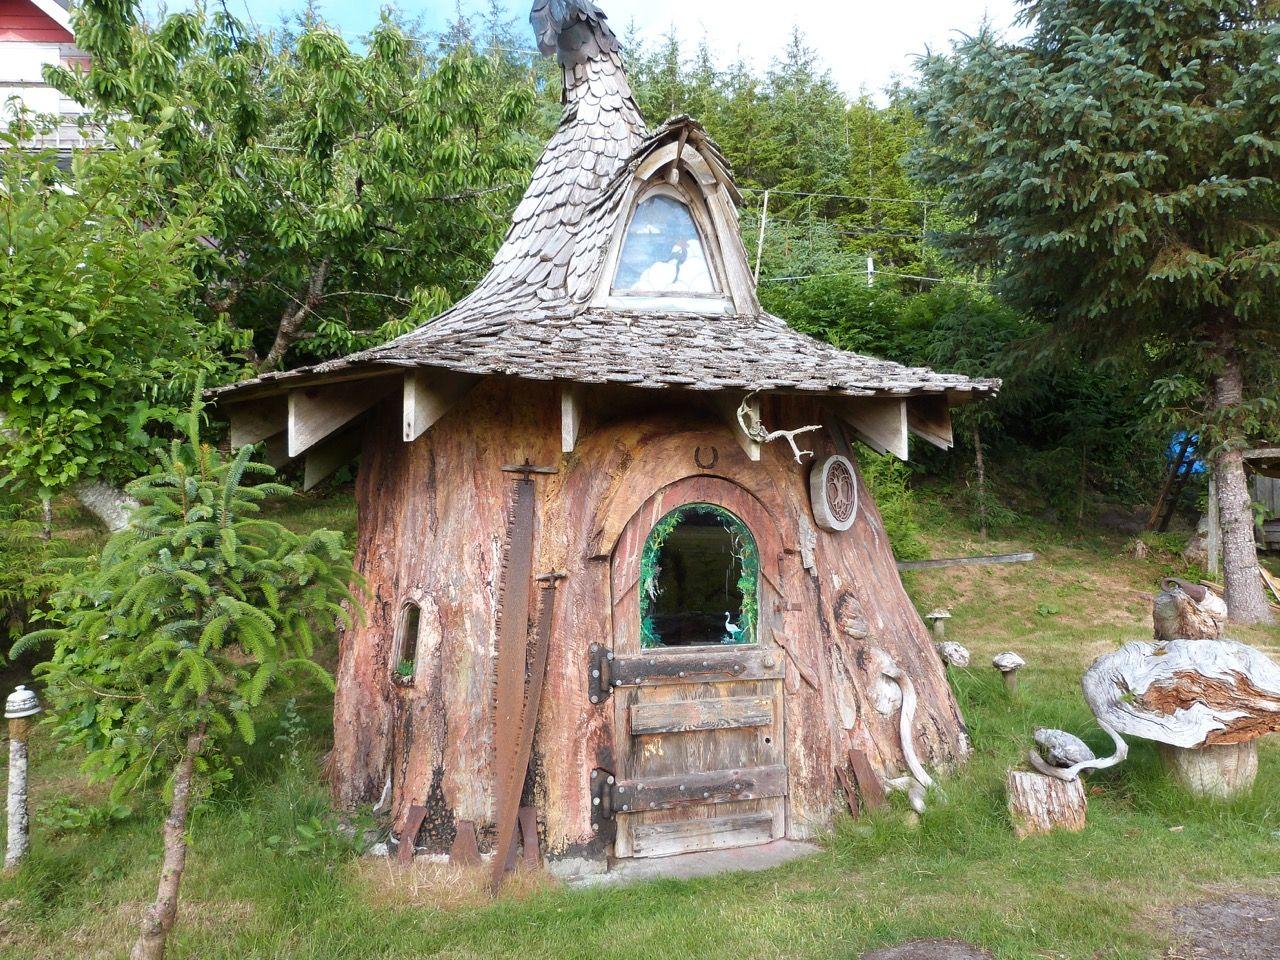 One Man Spent 22 Years on This Tree Stump Hobbit House